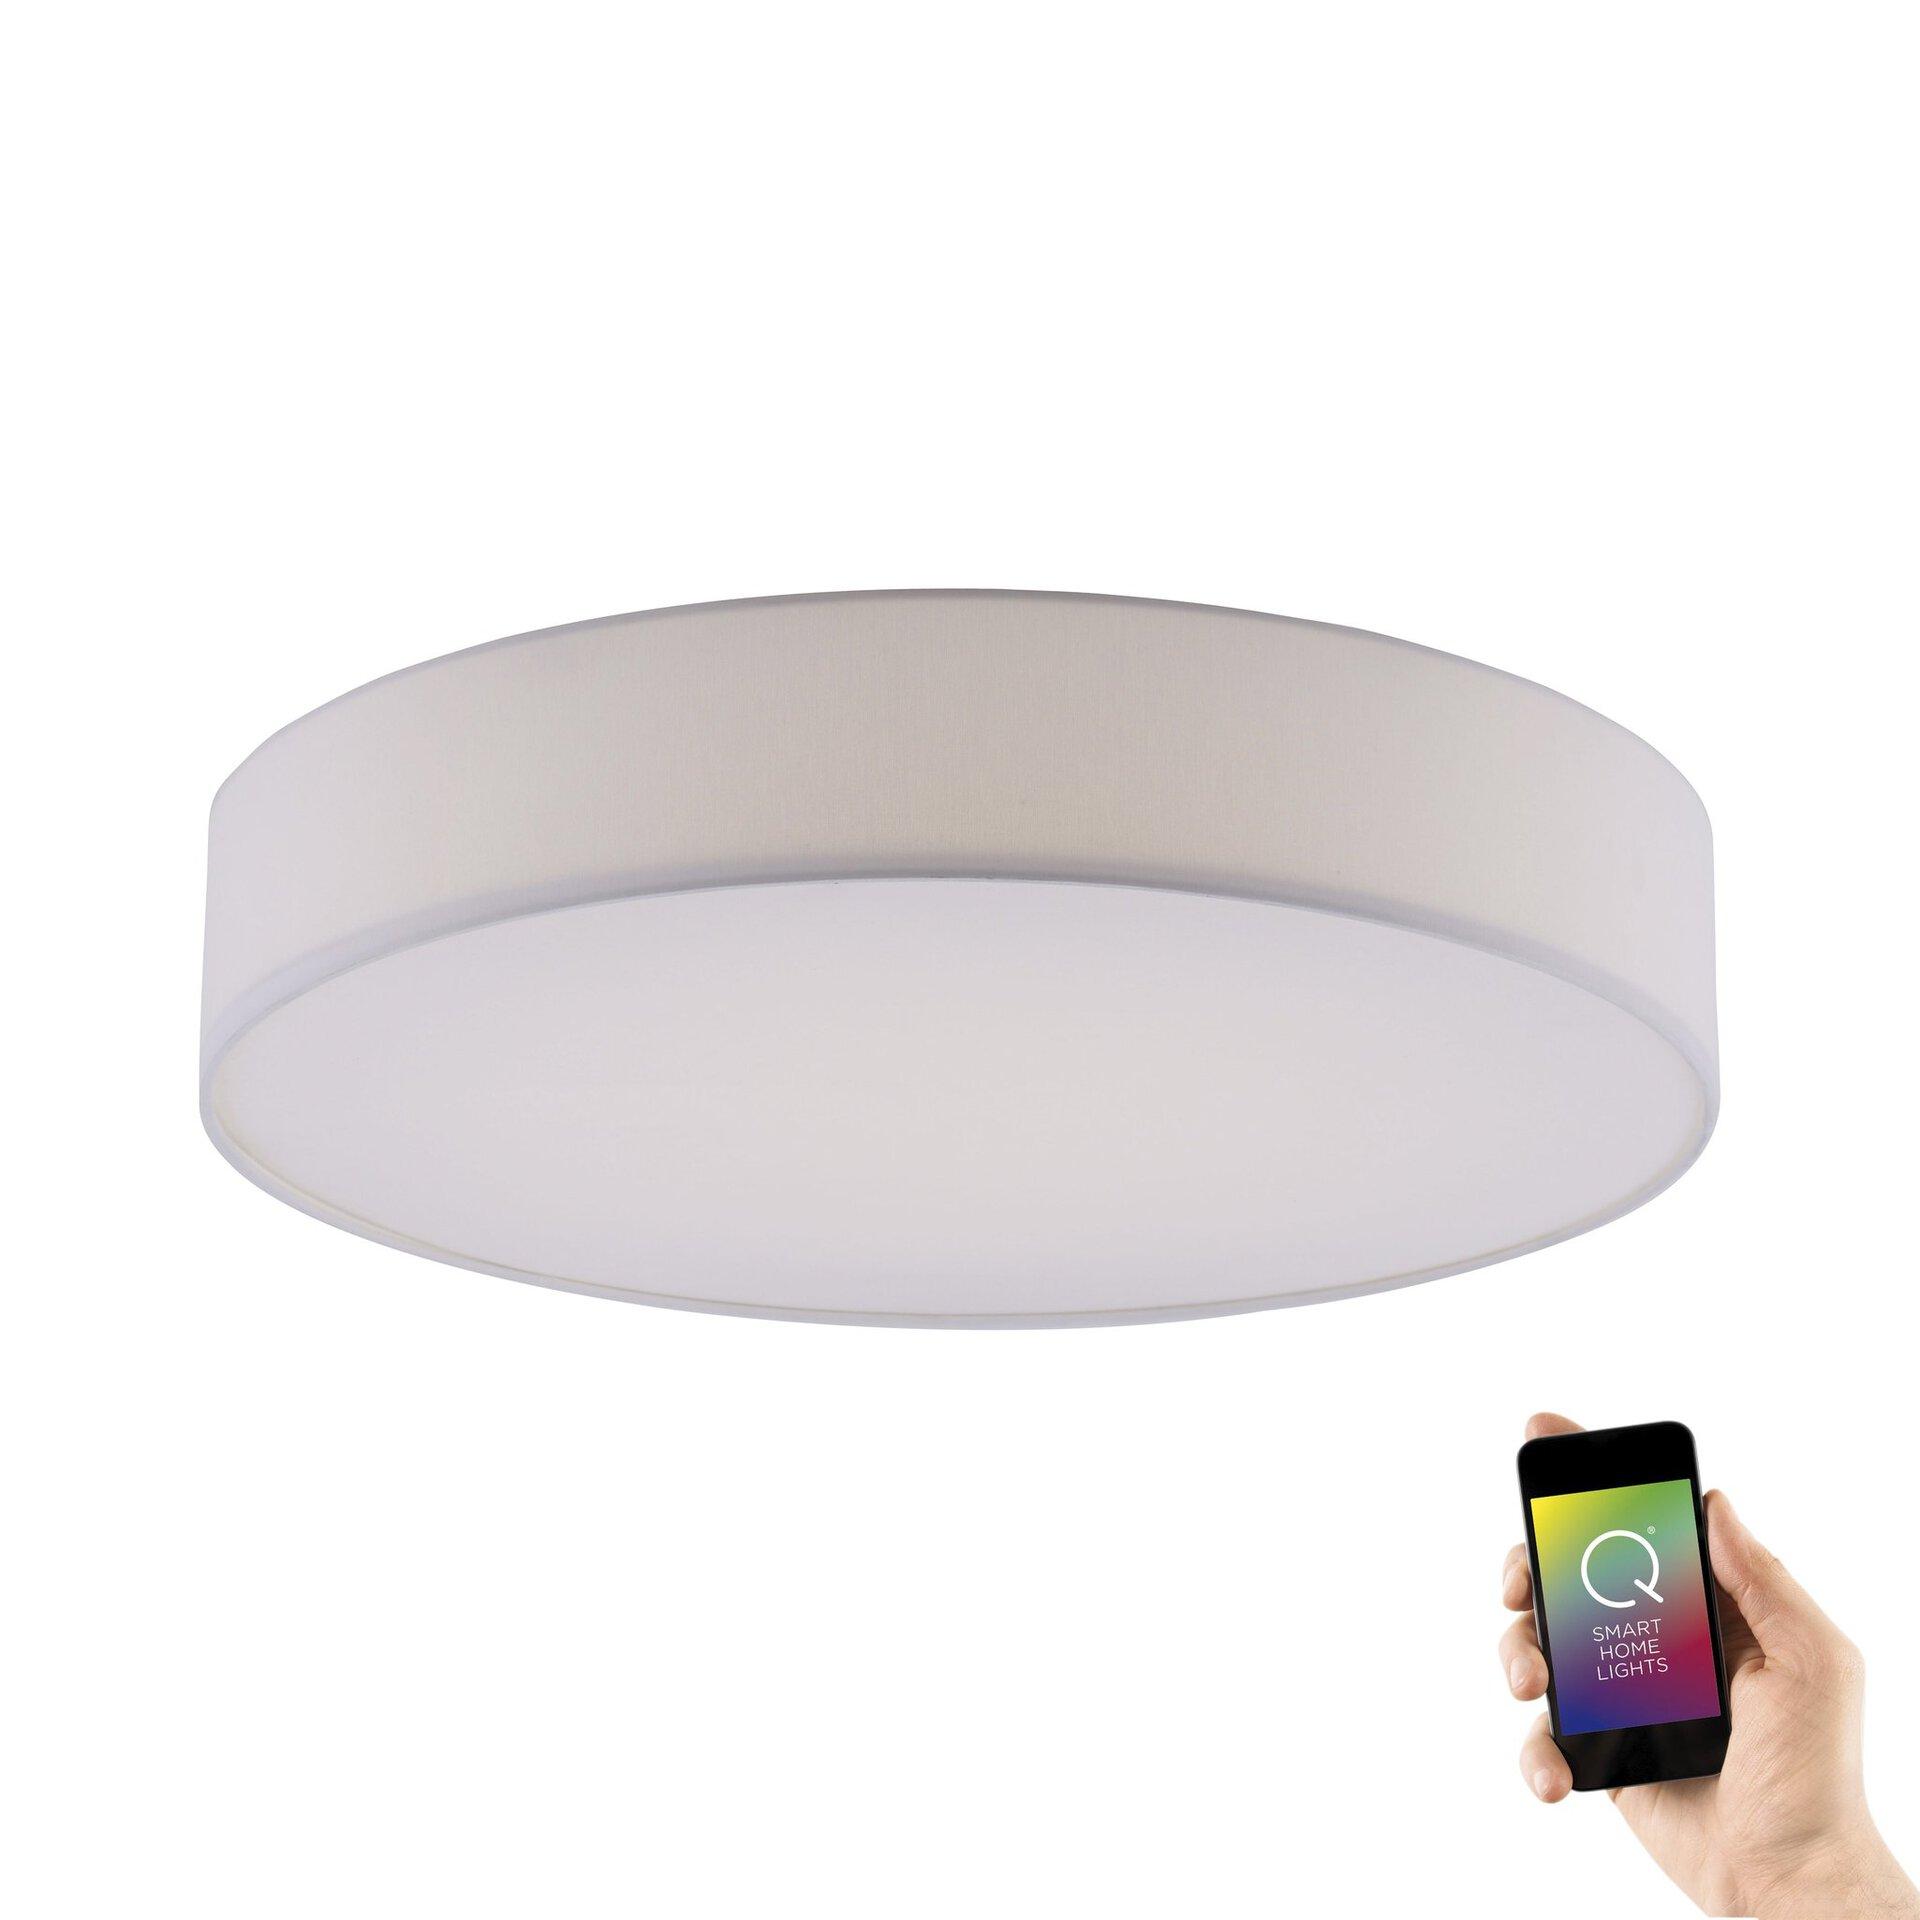 Smart-Home-Leuchten Q-KIARA Paul Neuhaus Metall weiß 58 x 11 x 58 cm